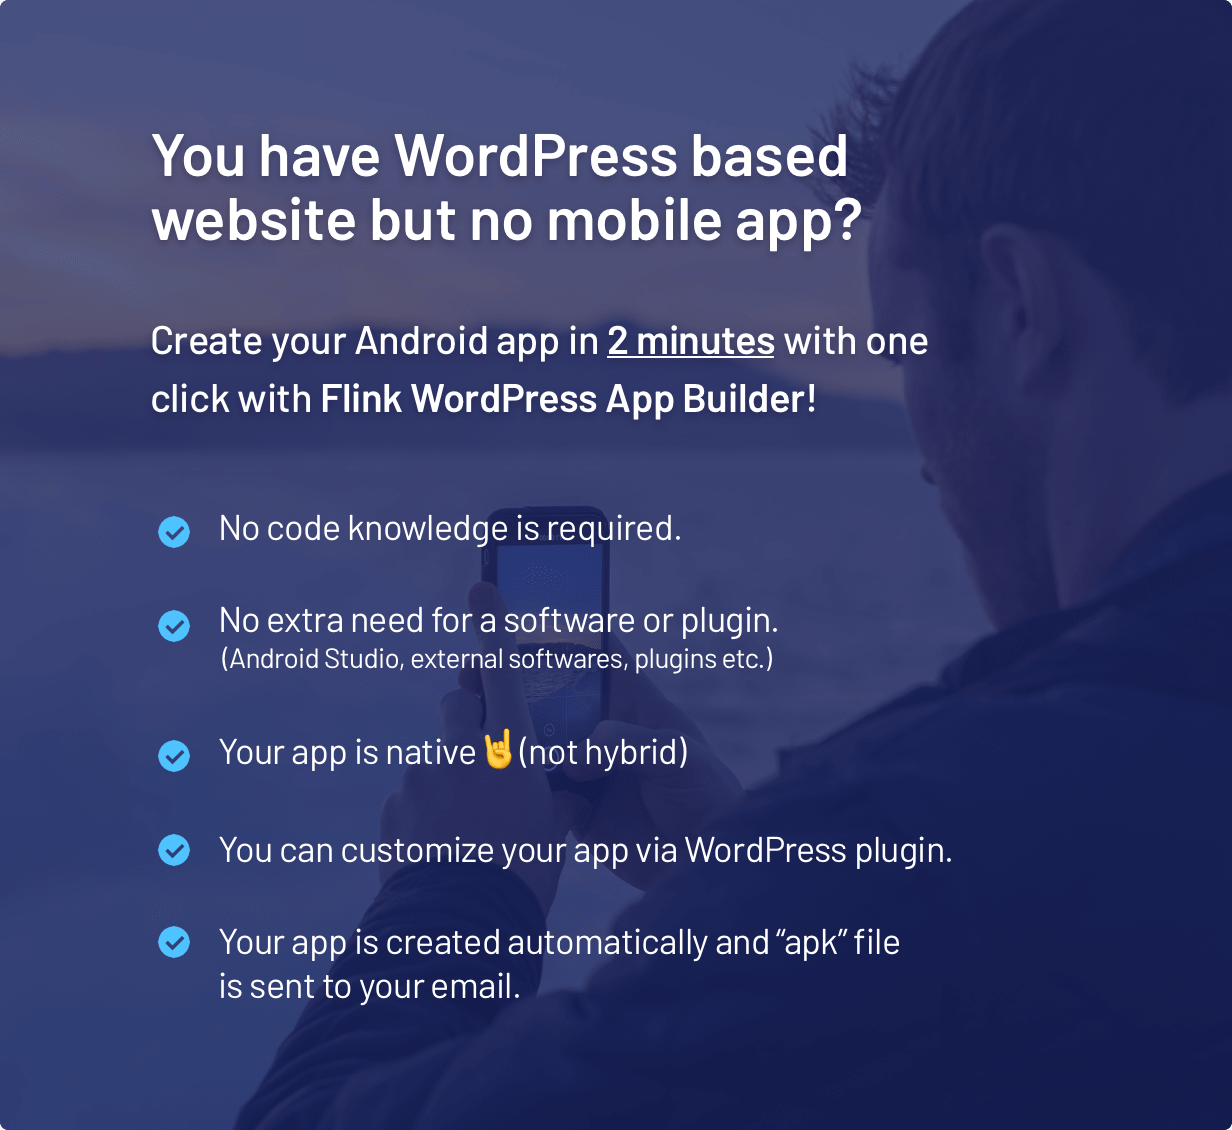 Flink - WordPress App Builder (Auto WordPress to Native Android App) + Ultimate Admin Panel - 1